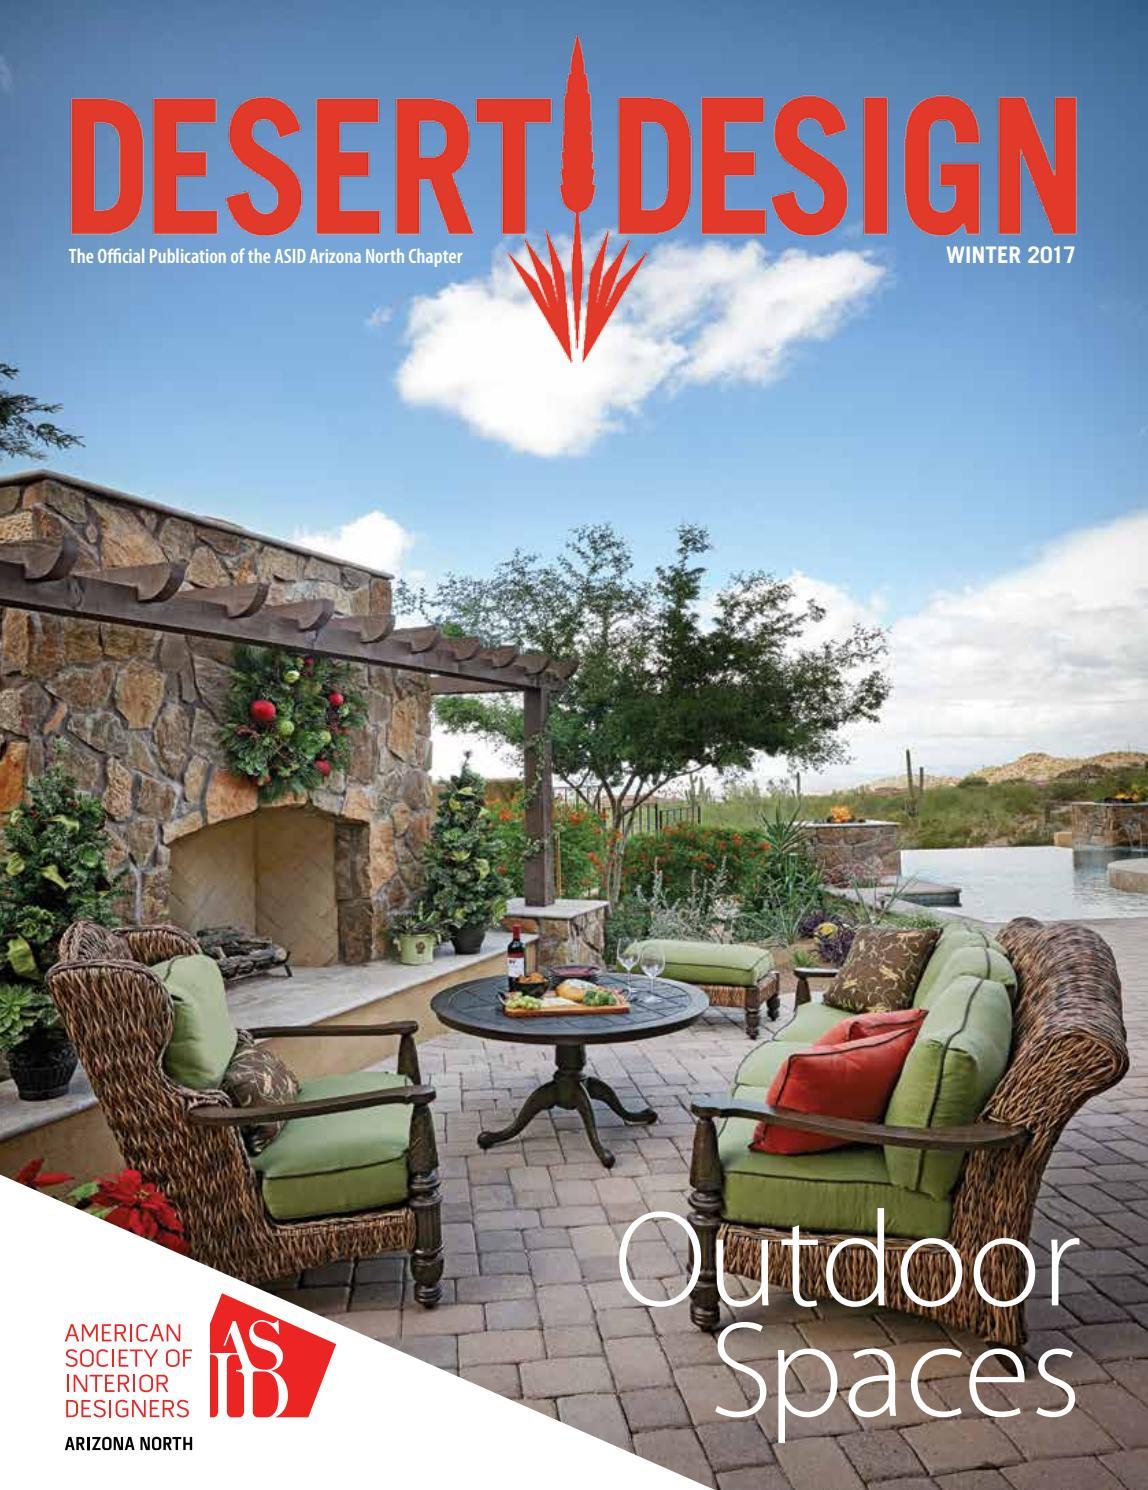 desert design magazine winter 2017 by arizona north chapter of